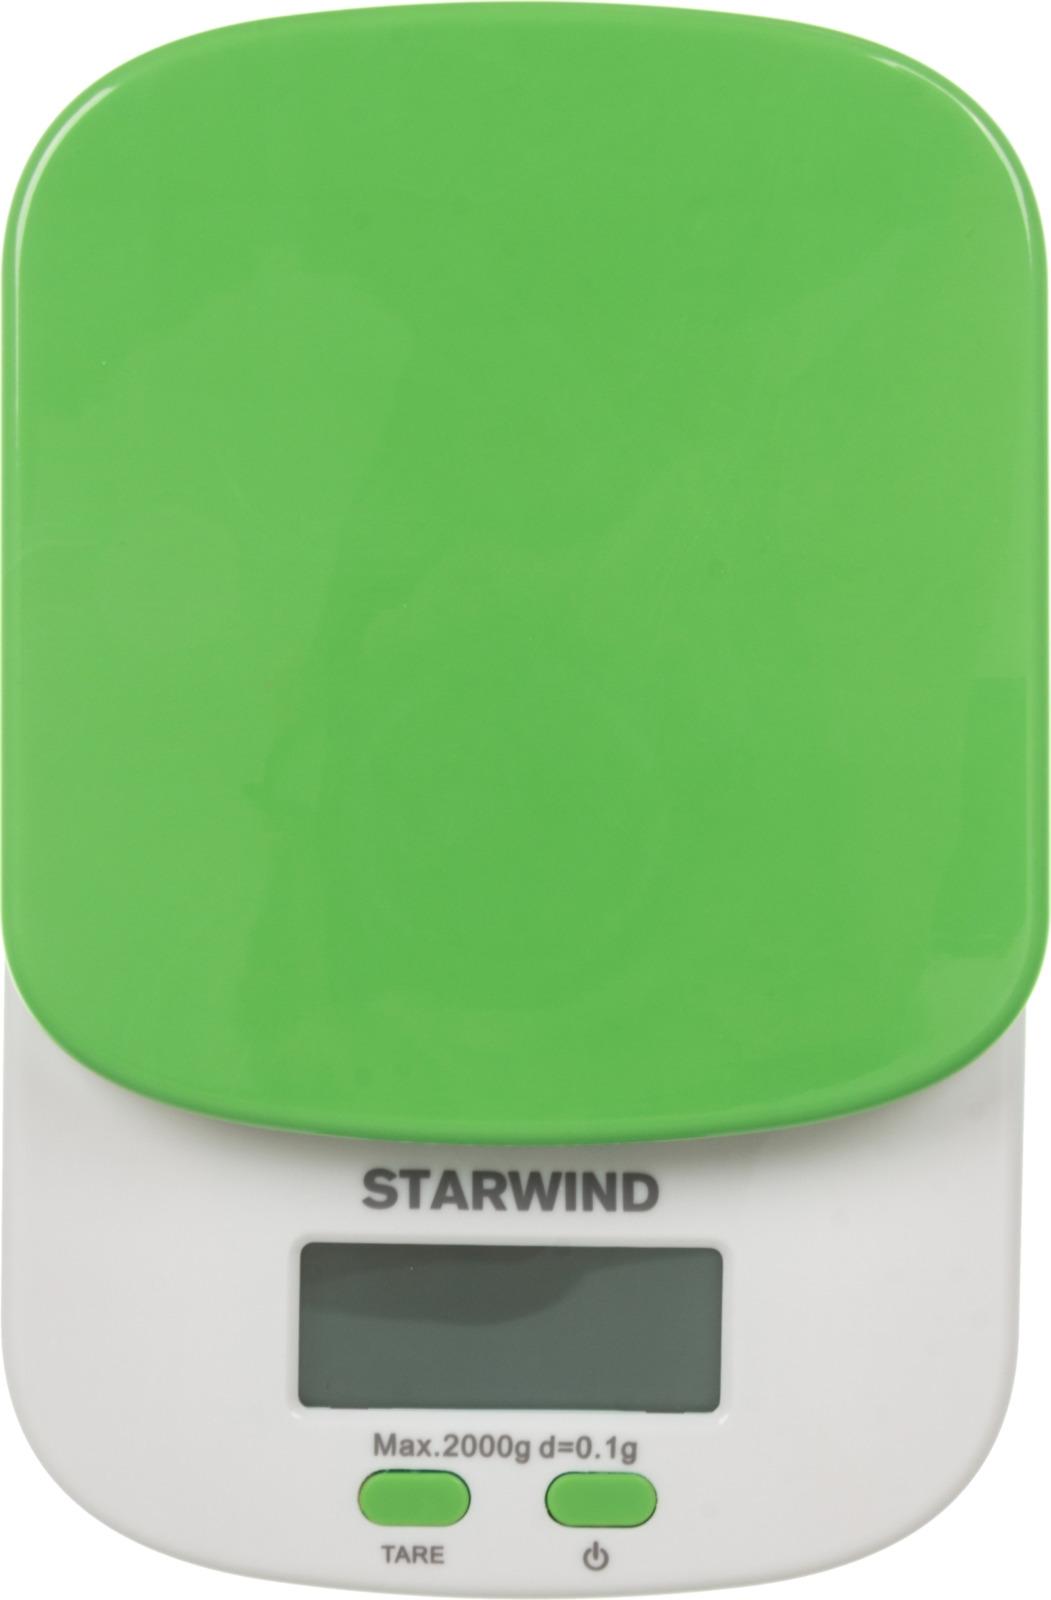 Starwind SSK2155, Green весы кухонные